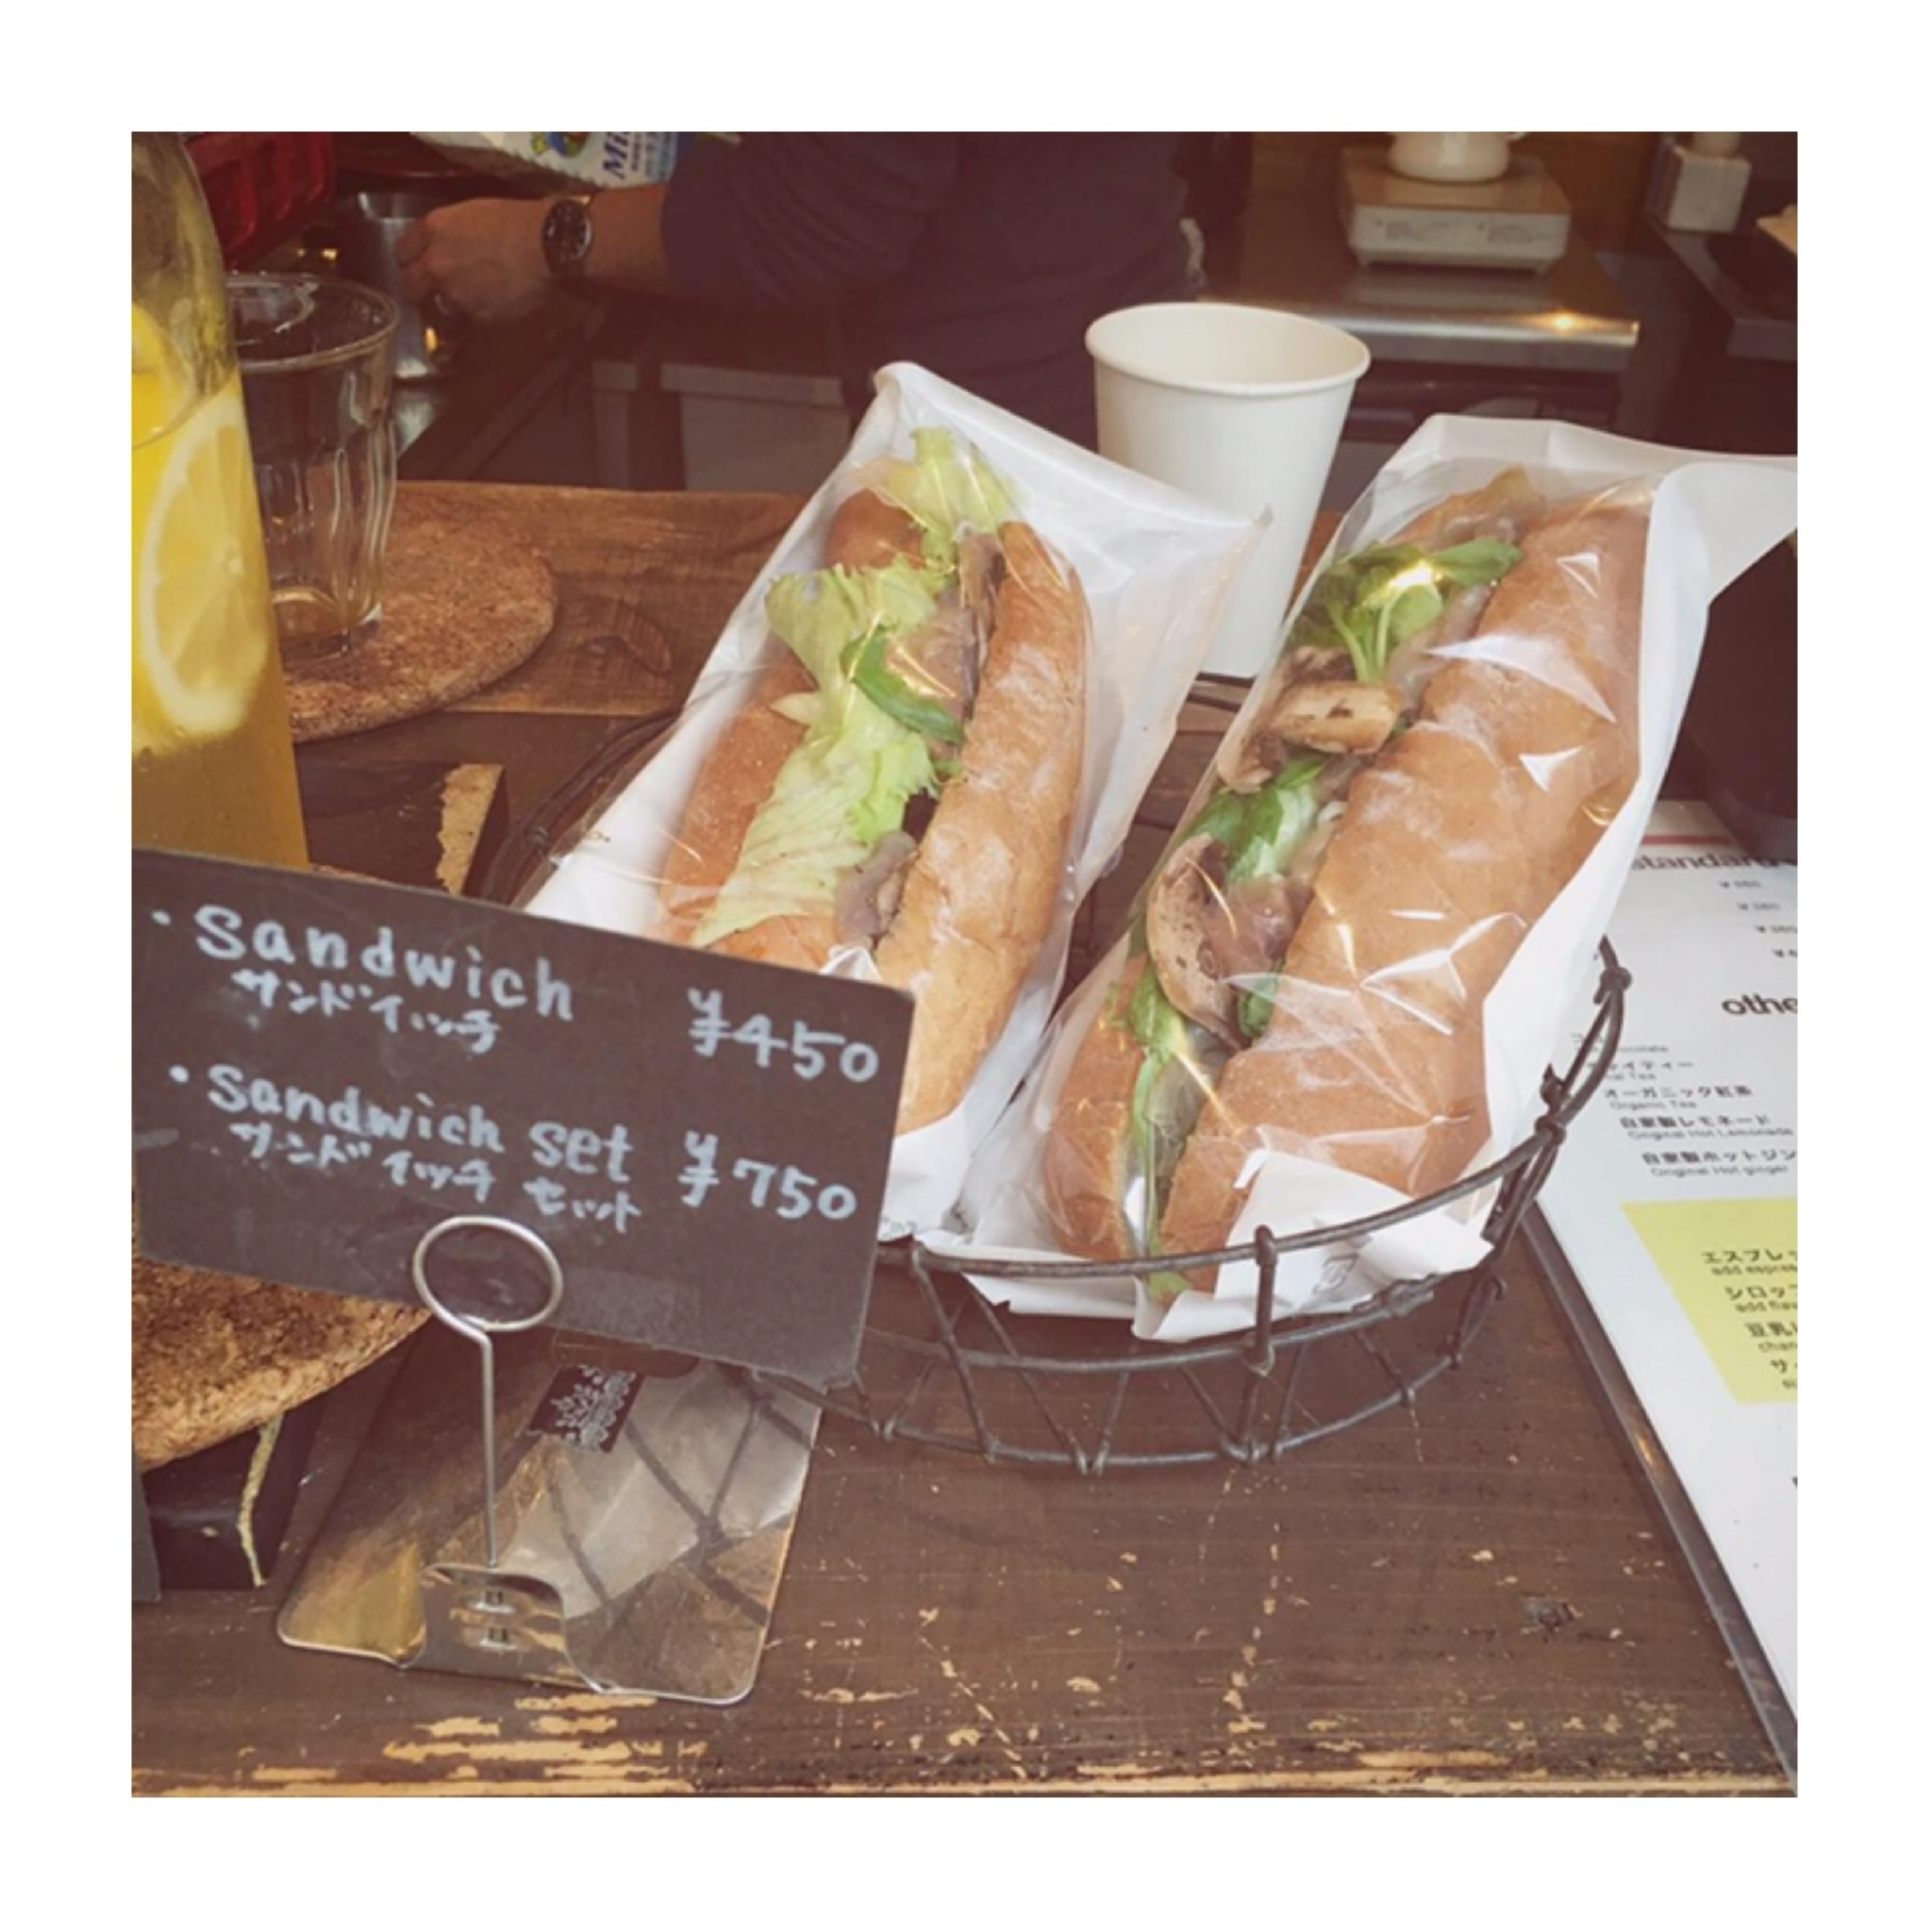 #15【#cafestagram】❤️:《東京•蔵前》身体にやさしいコーヒーを飲みに『SOL'S COFFEE』へ☻_3